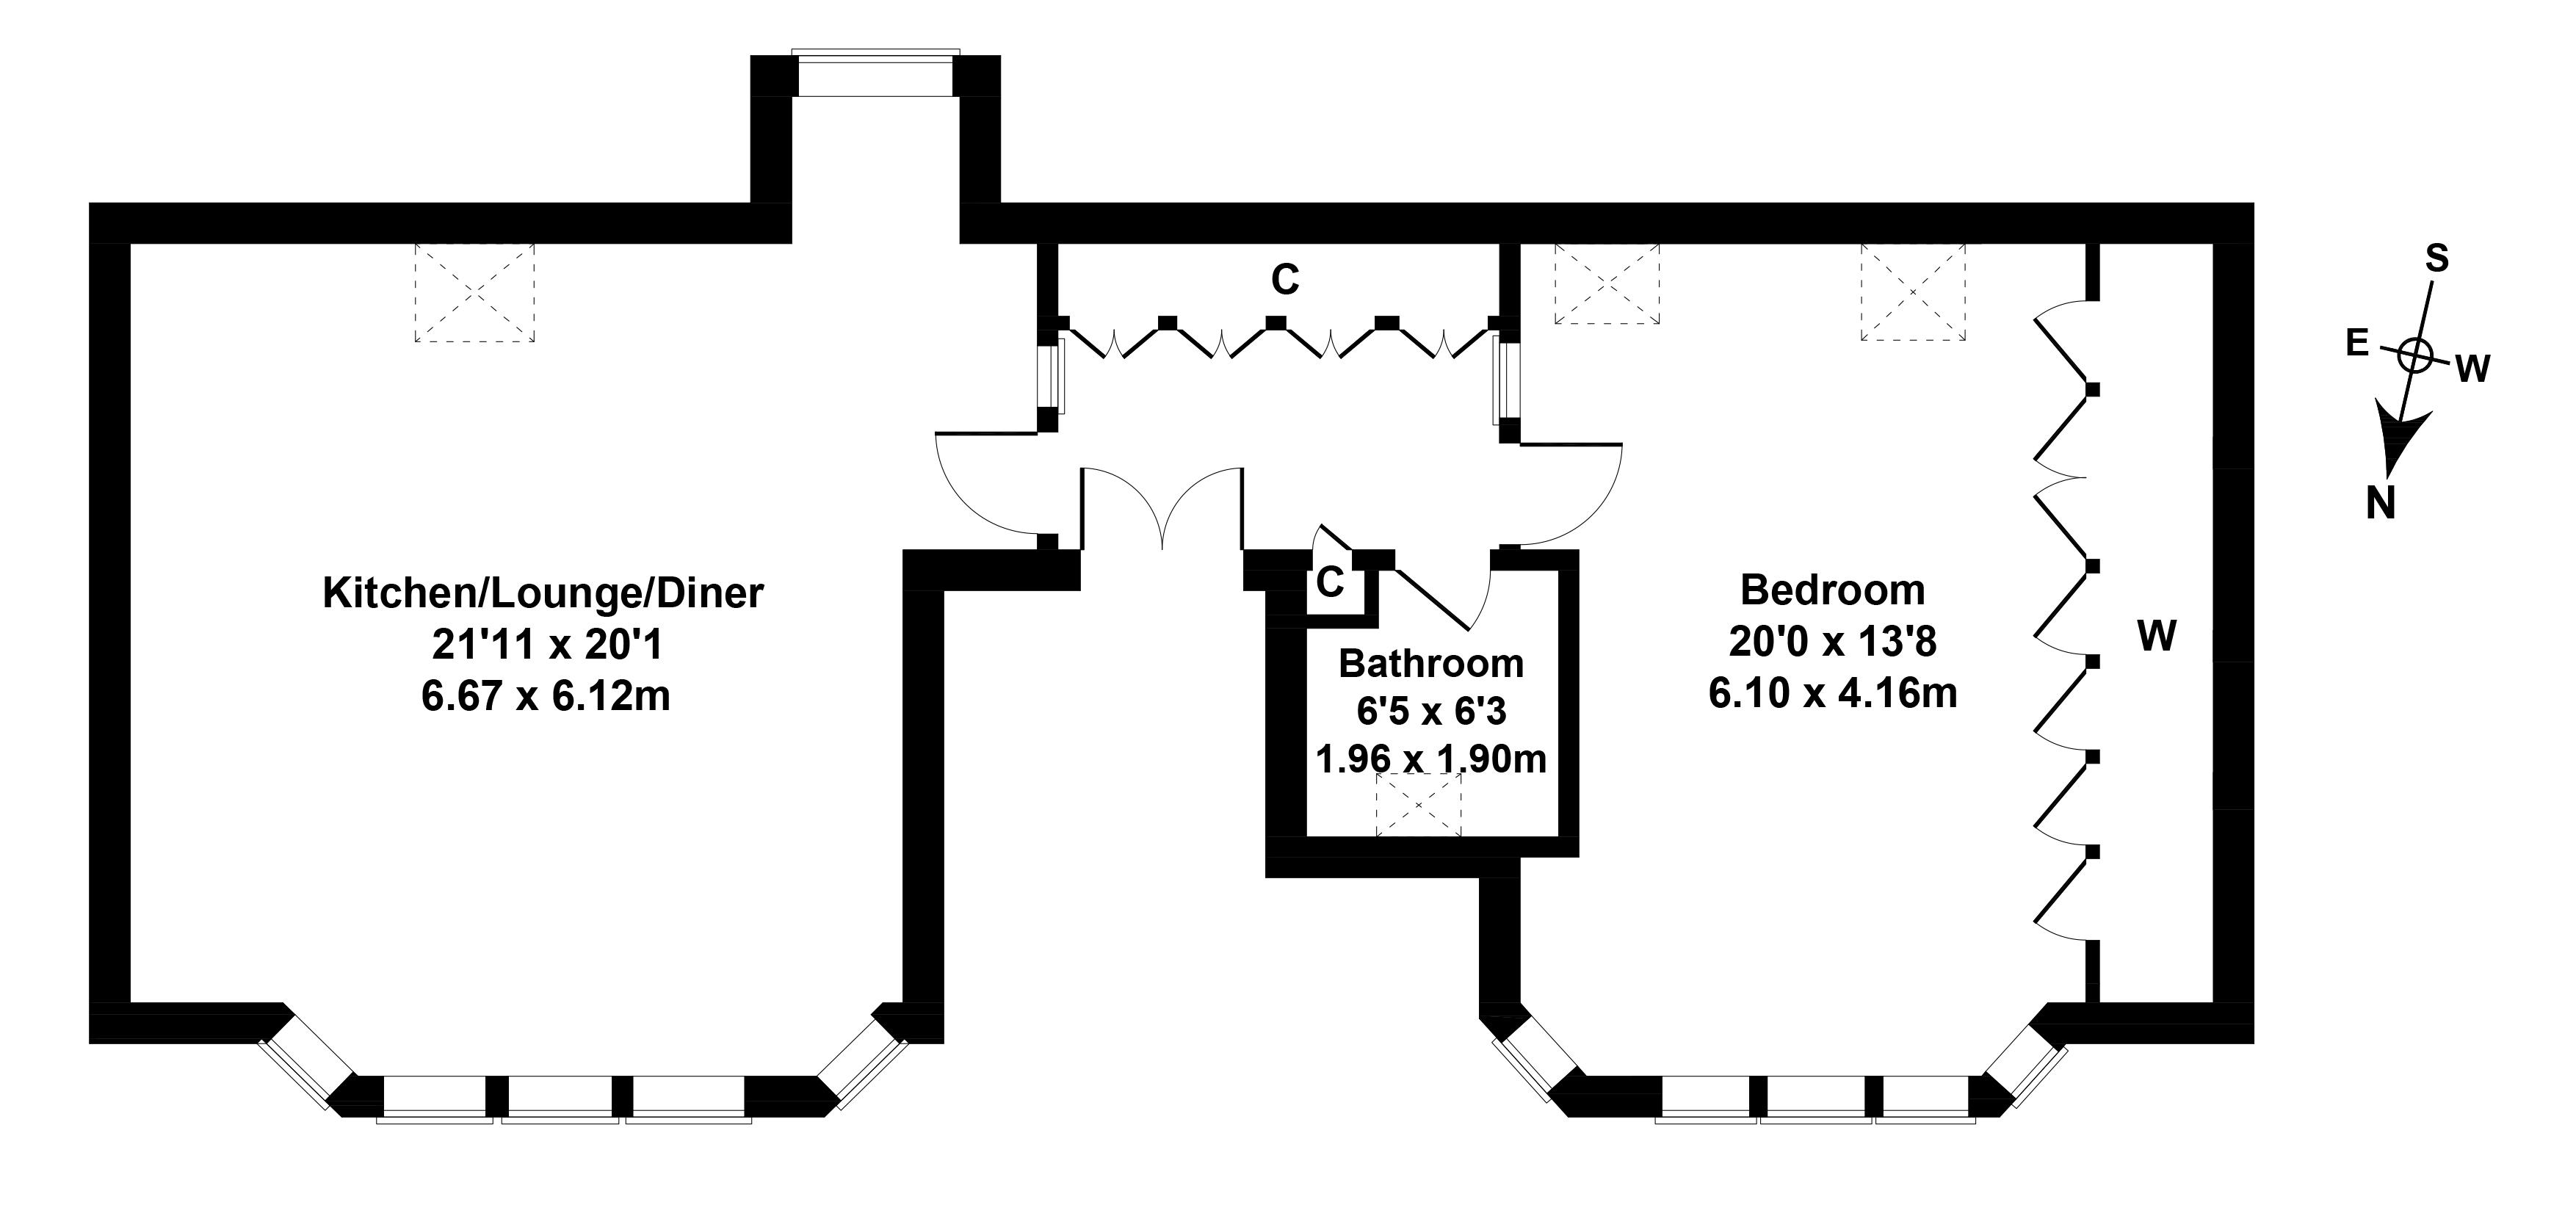 Floorplan 1 of 25/7, Eyre Place, New Town, Edinburgh, EH3 5EX